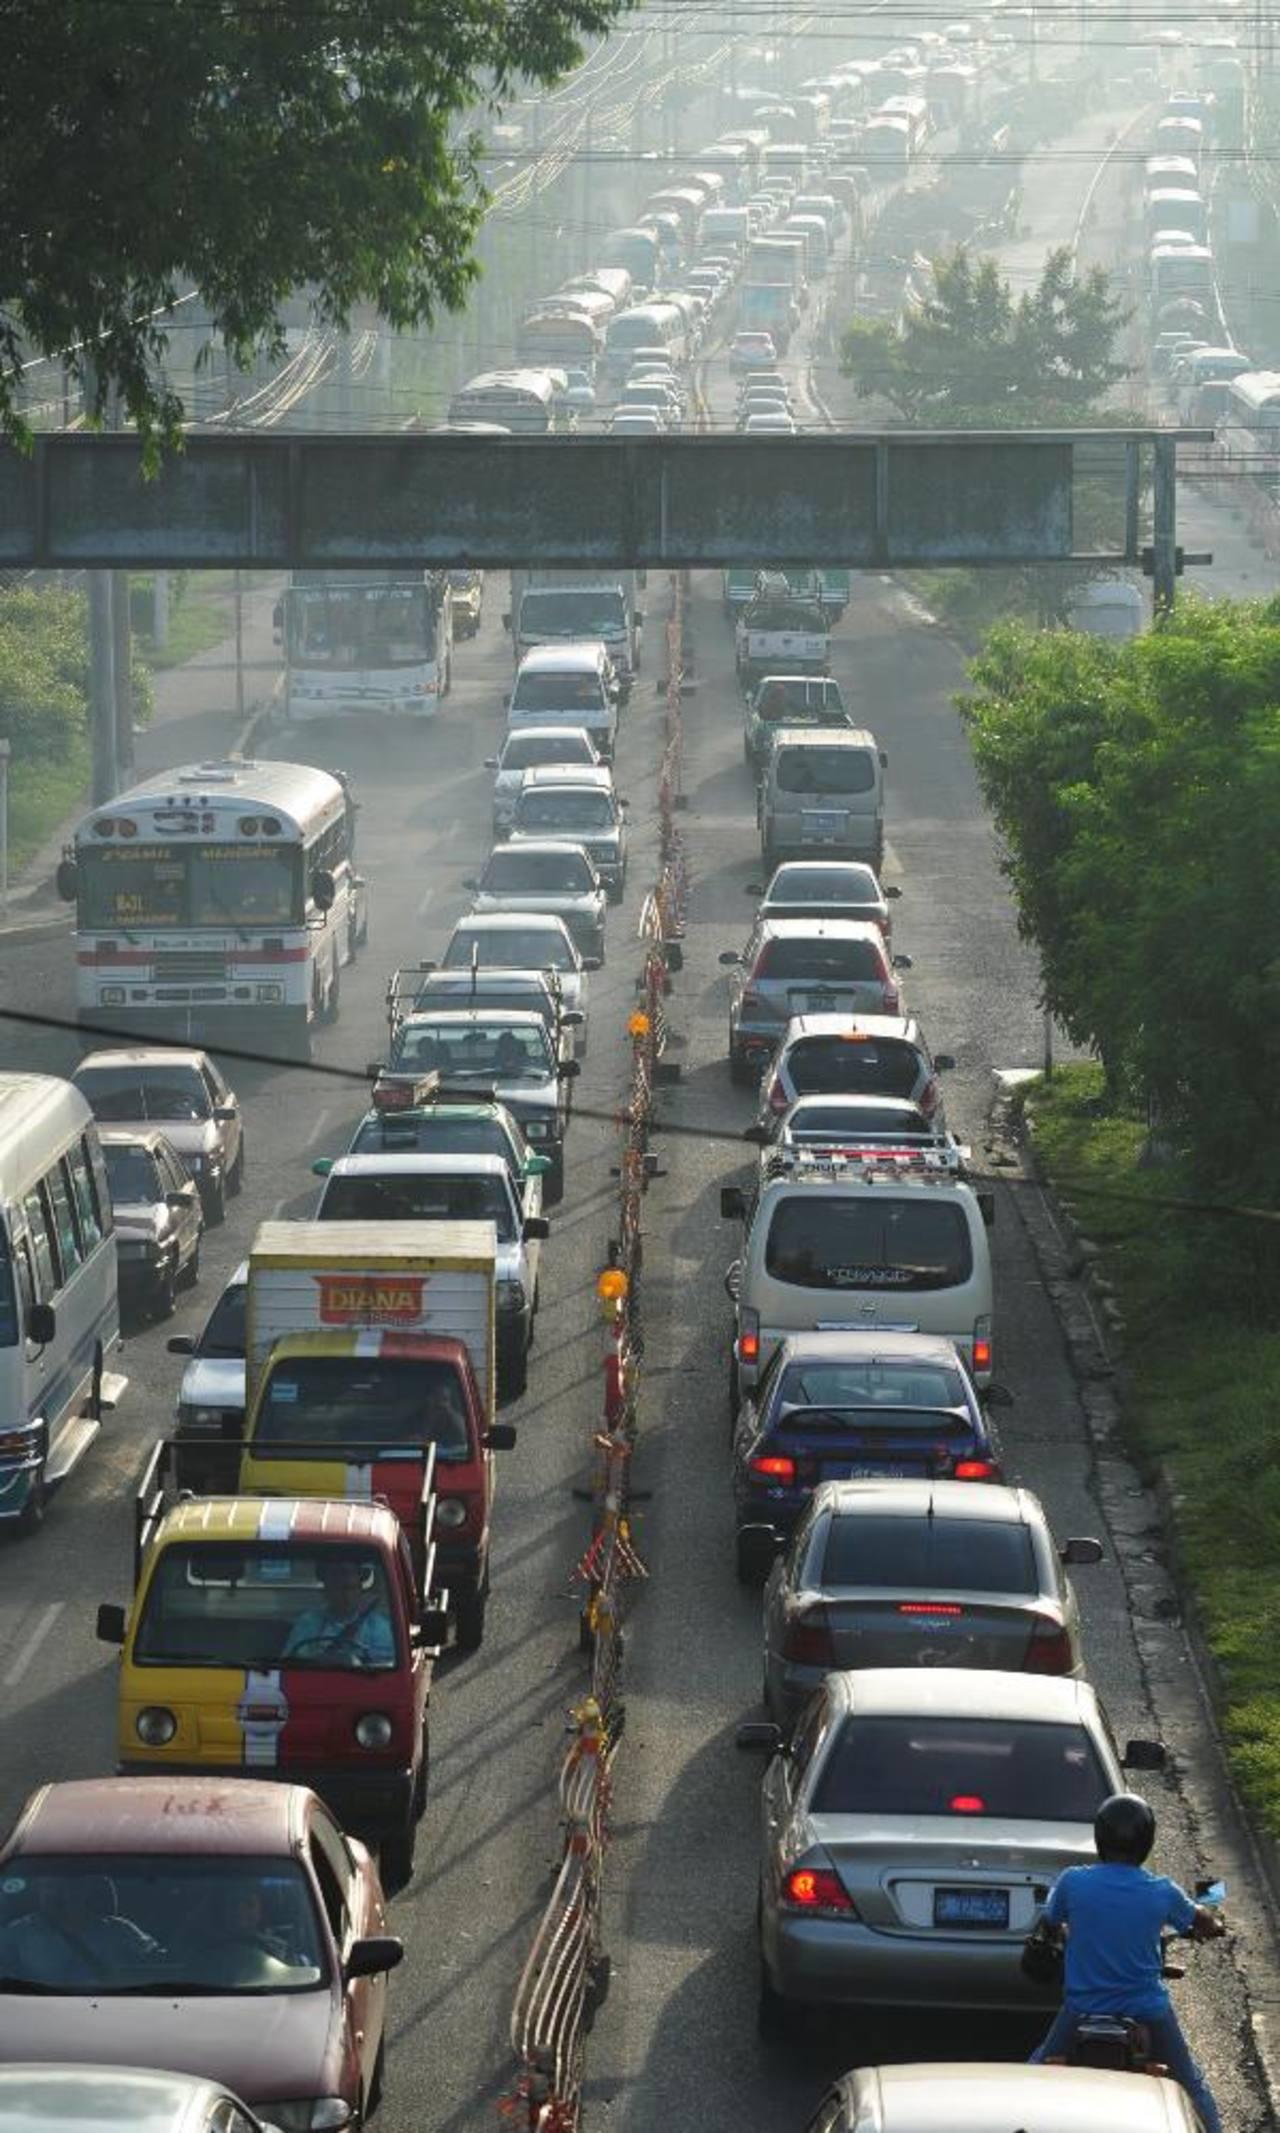 El tráfico transcurrió lento en horas pico para poder llegar a la capital. Fotos EDH / Lissette Lemus